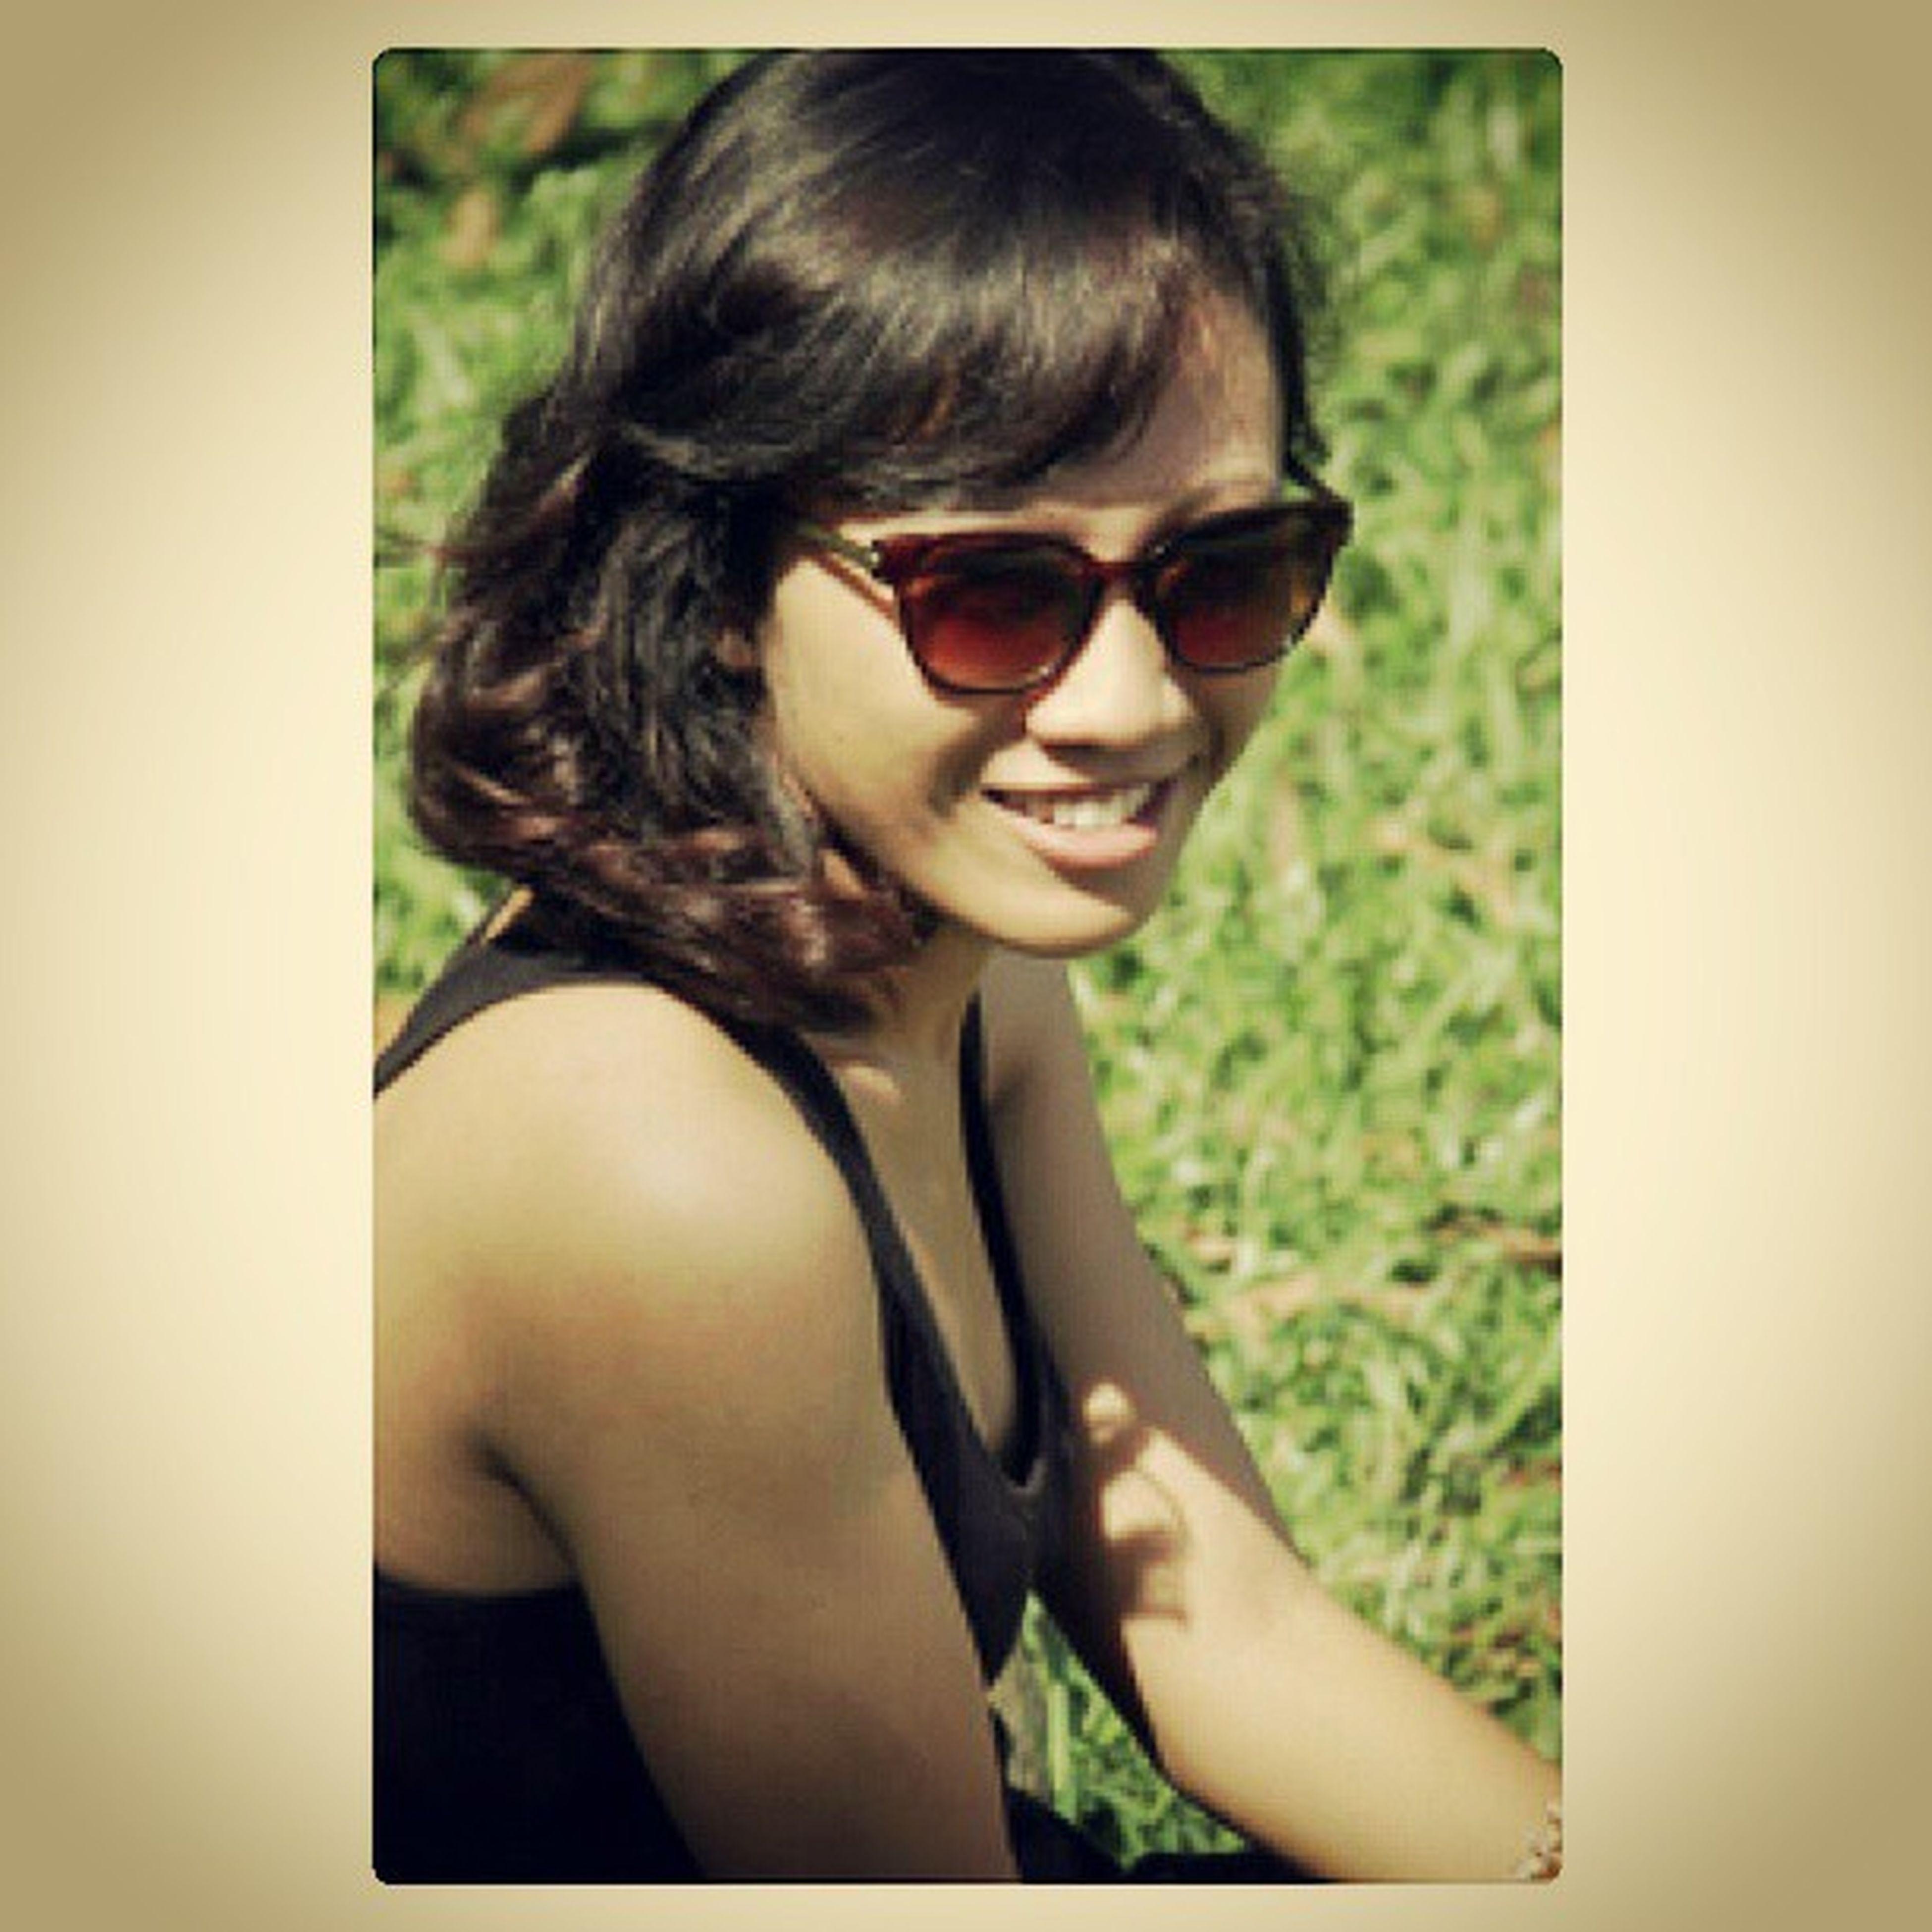 Photooftheday Iphongram Iphonesia Instaphoto instagood cibubur sunglasses